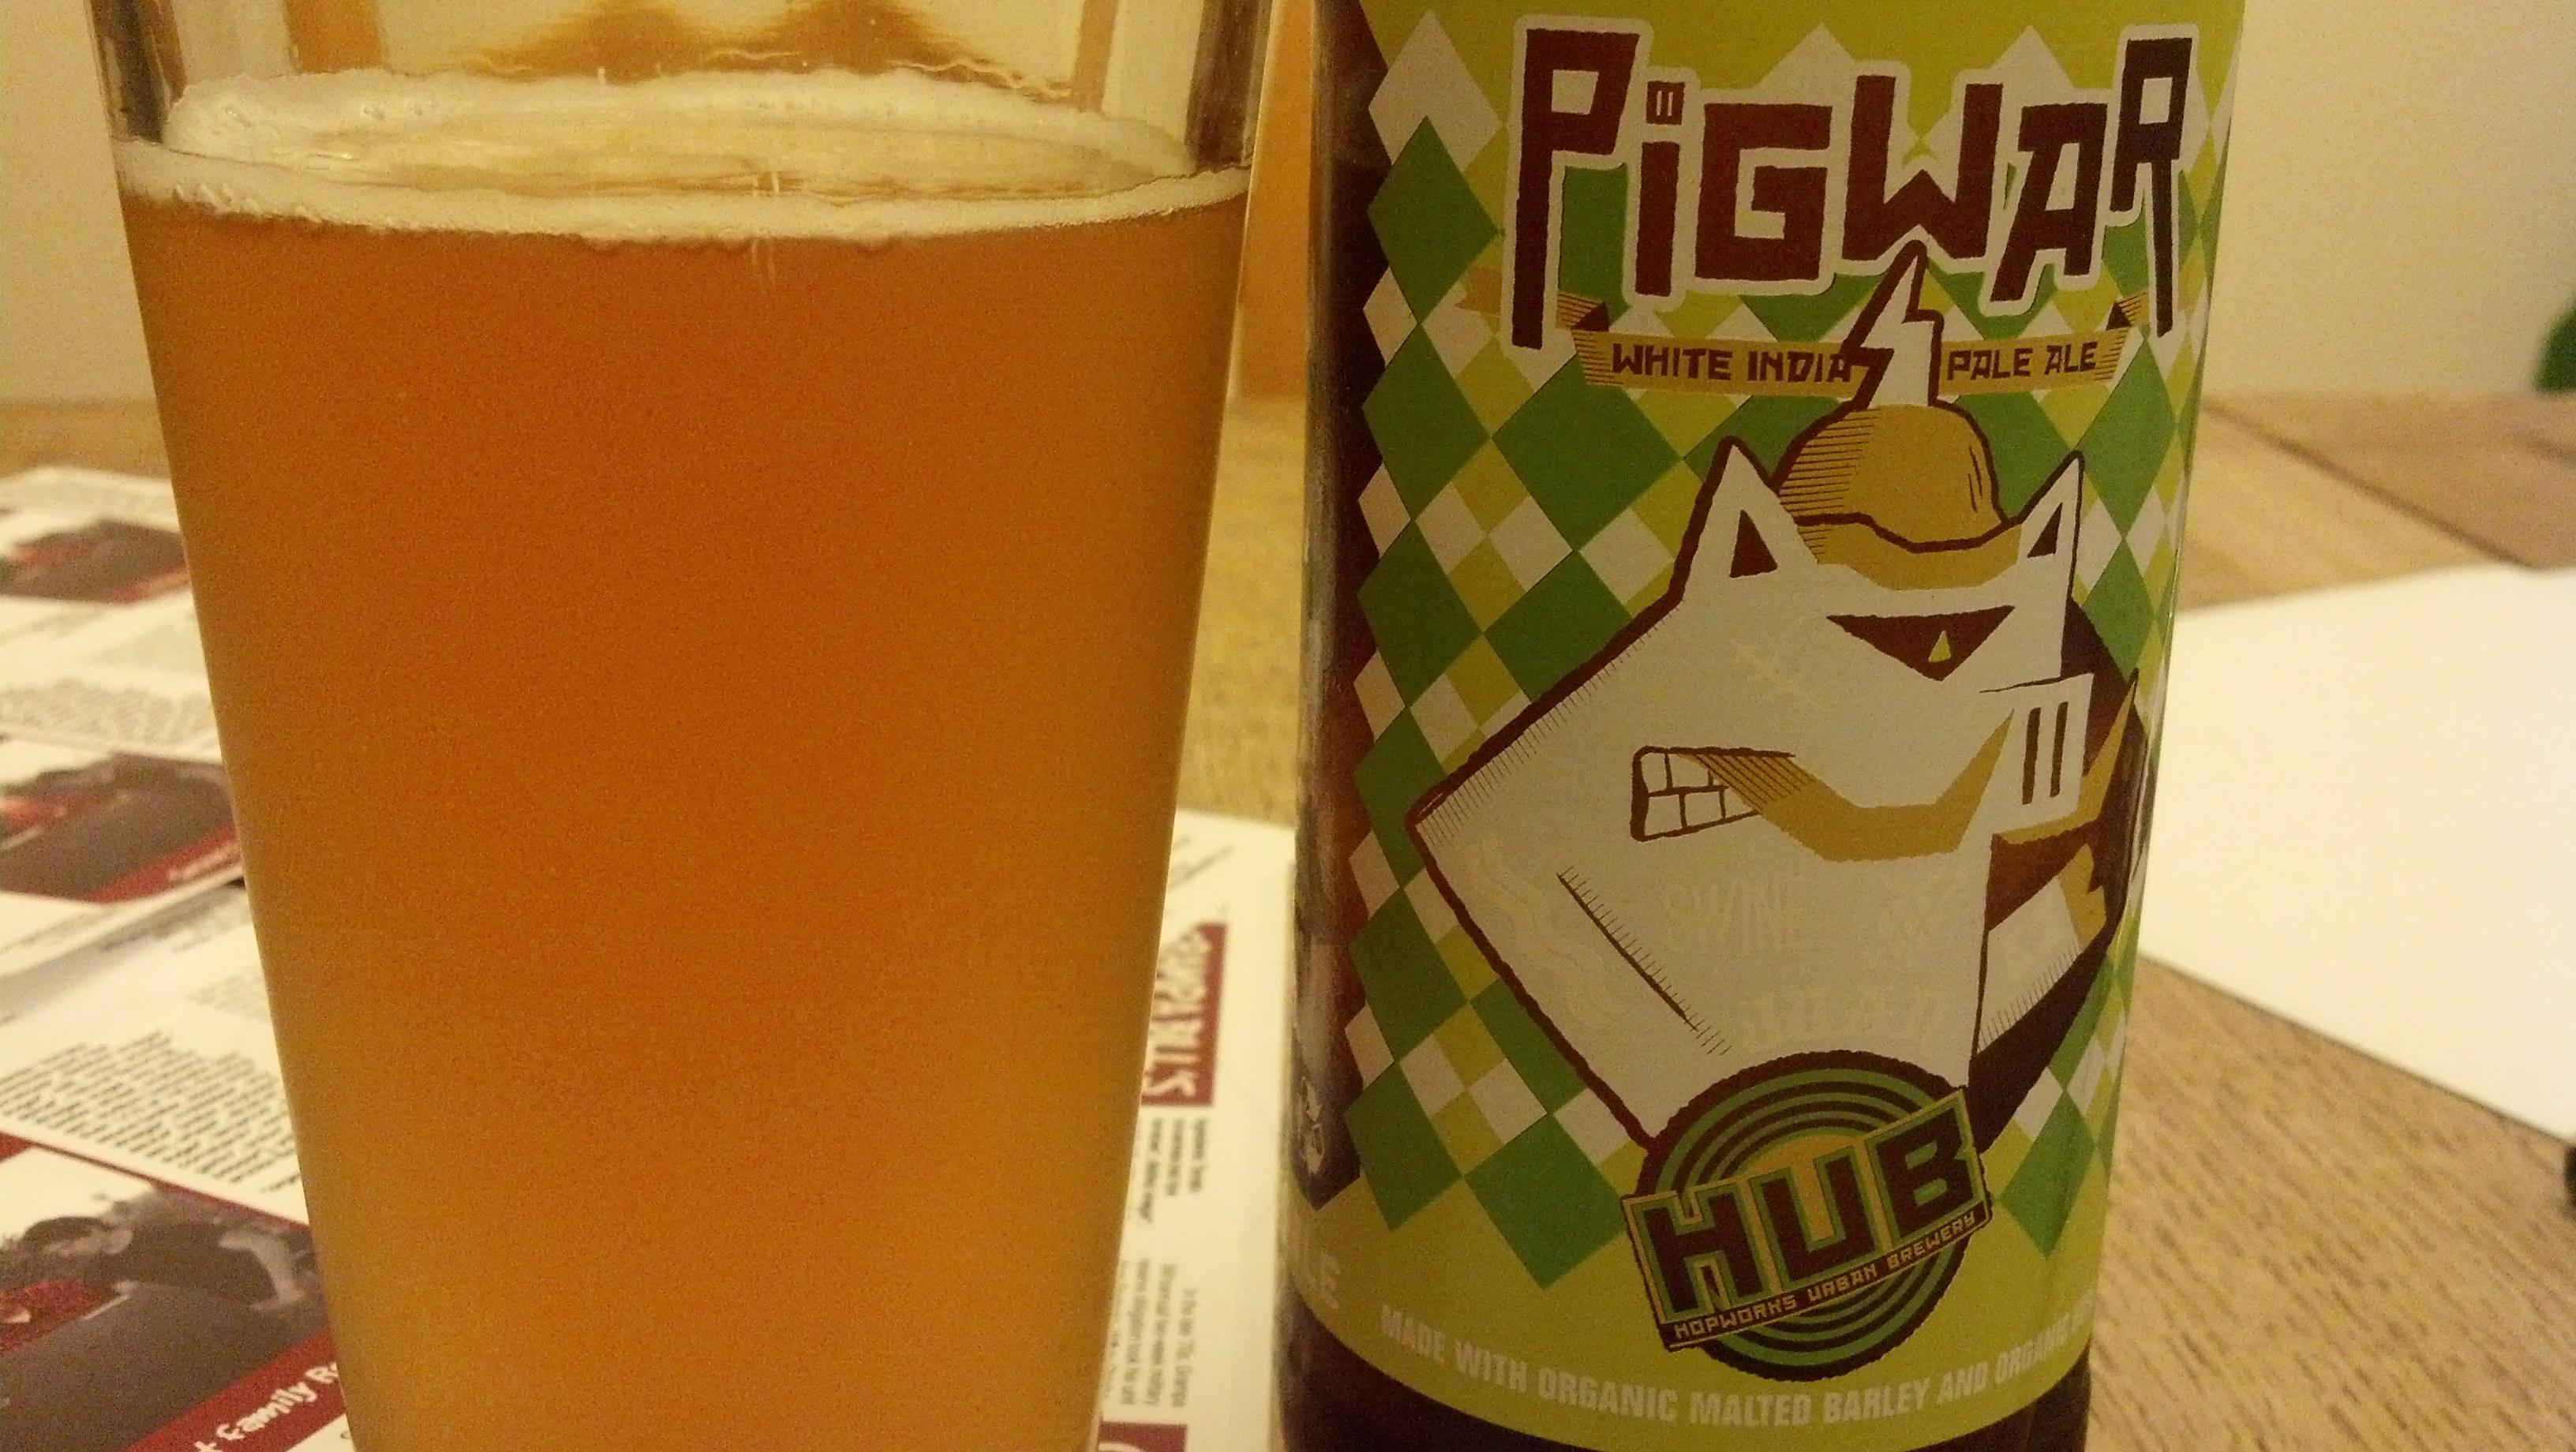 Friday Happy Hour – HUB's Pigwar White India Pale Ale